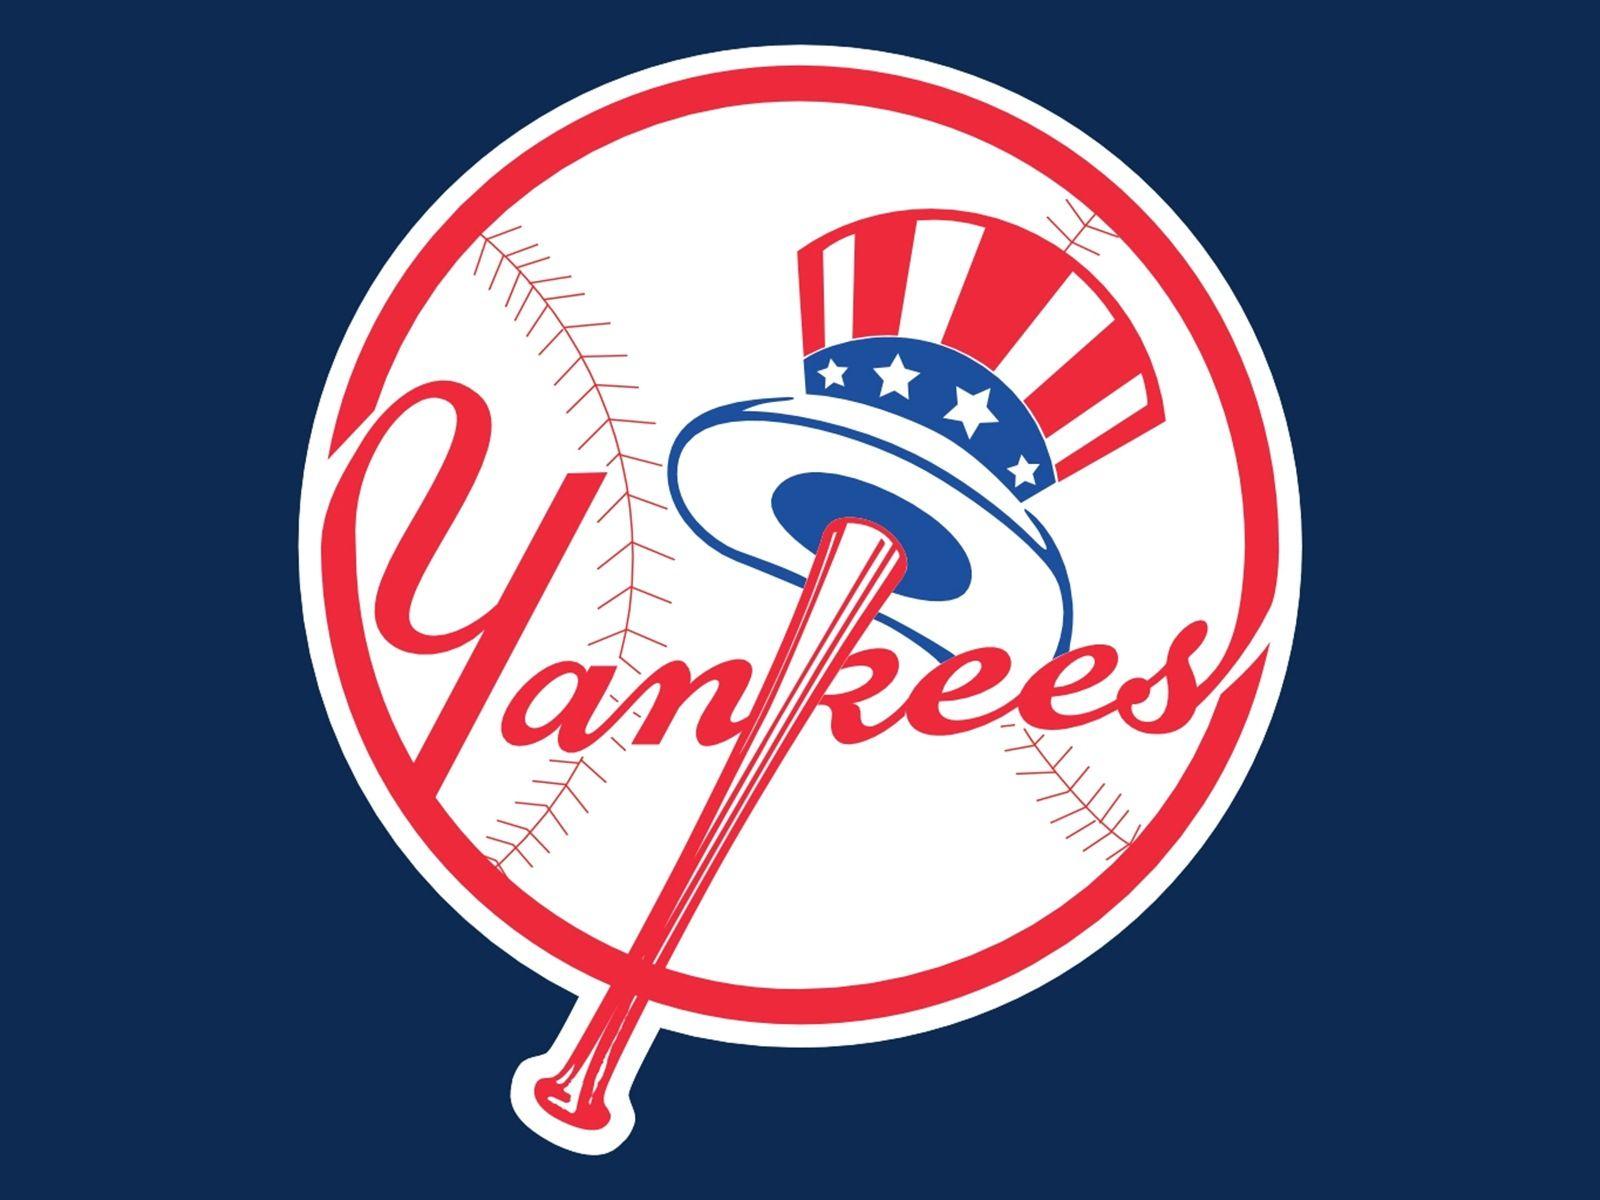 New York Yankees Logo New York Yankees Logo Wallpaper Logo New York Yankees Logo Yankees Baseball New York Yankees